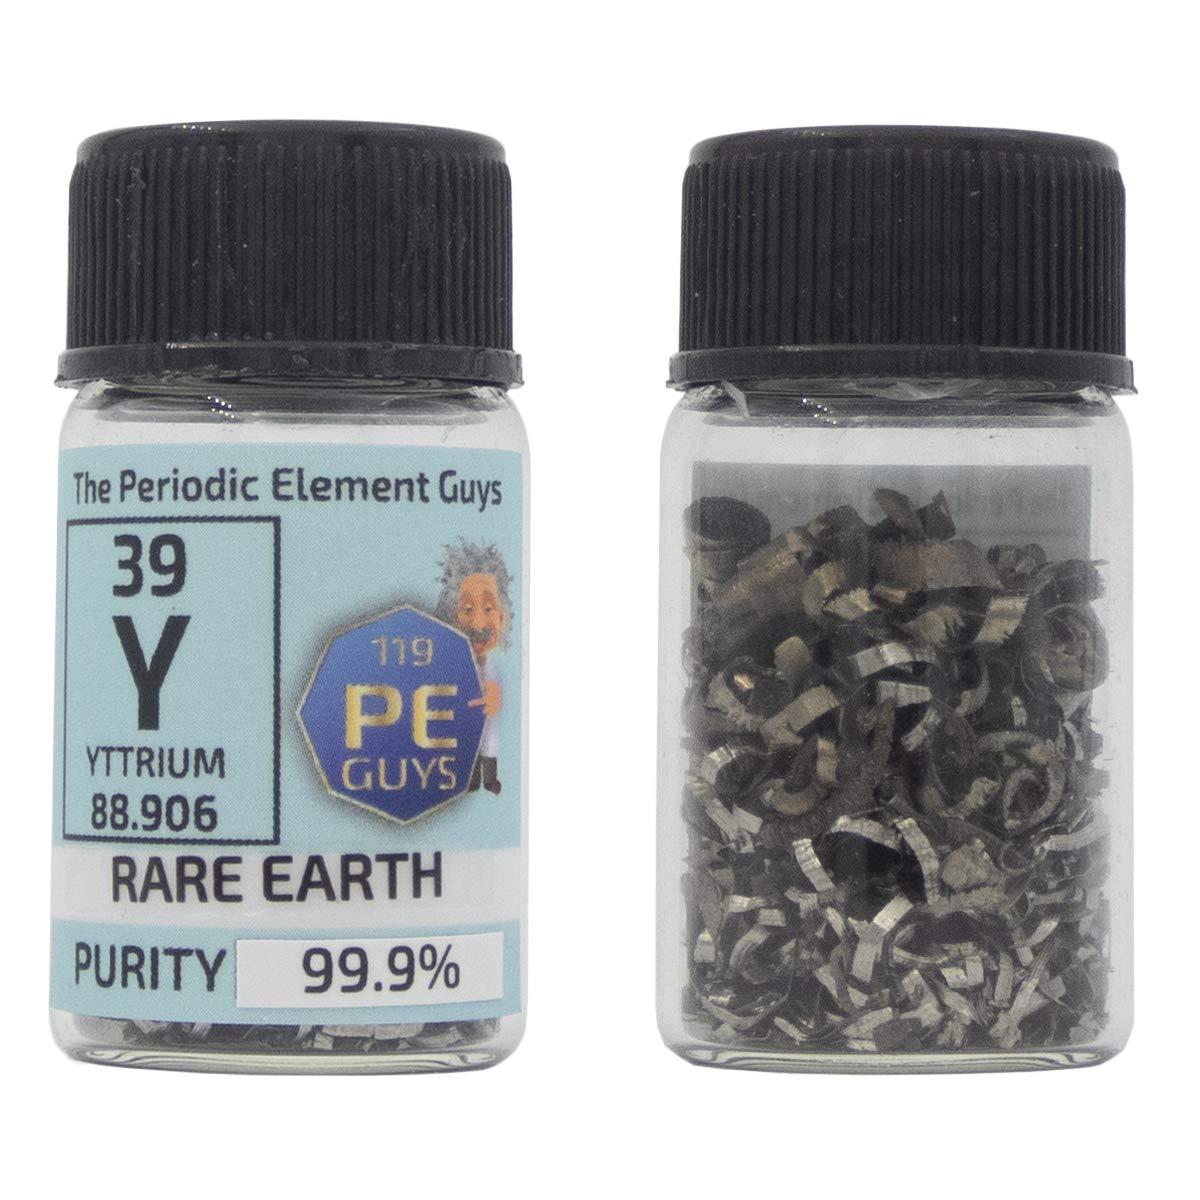 Yttrium Metal Turnings 2g 99.9% Pure Rare Earth Element Sample in PEGUYS Element Bottle